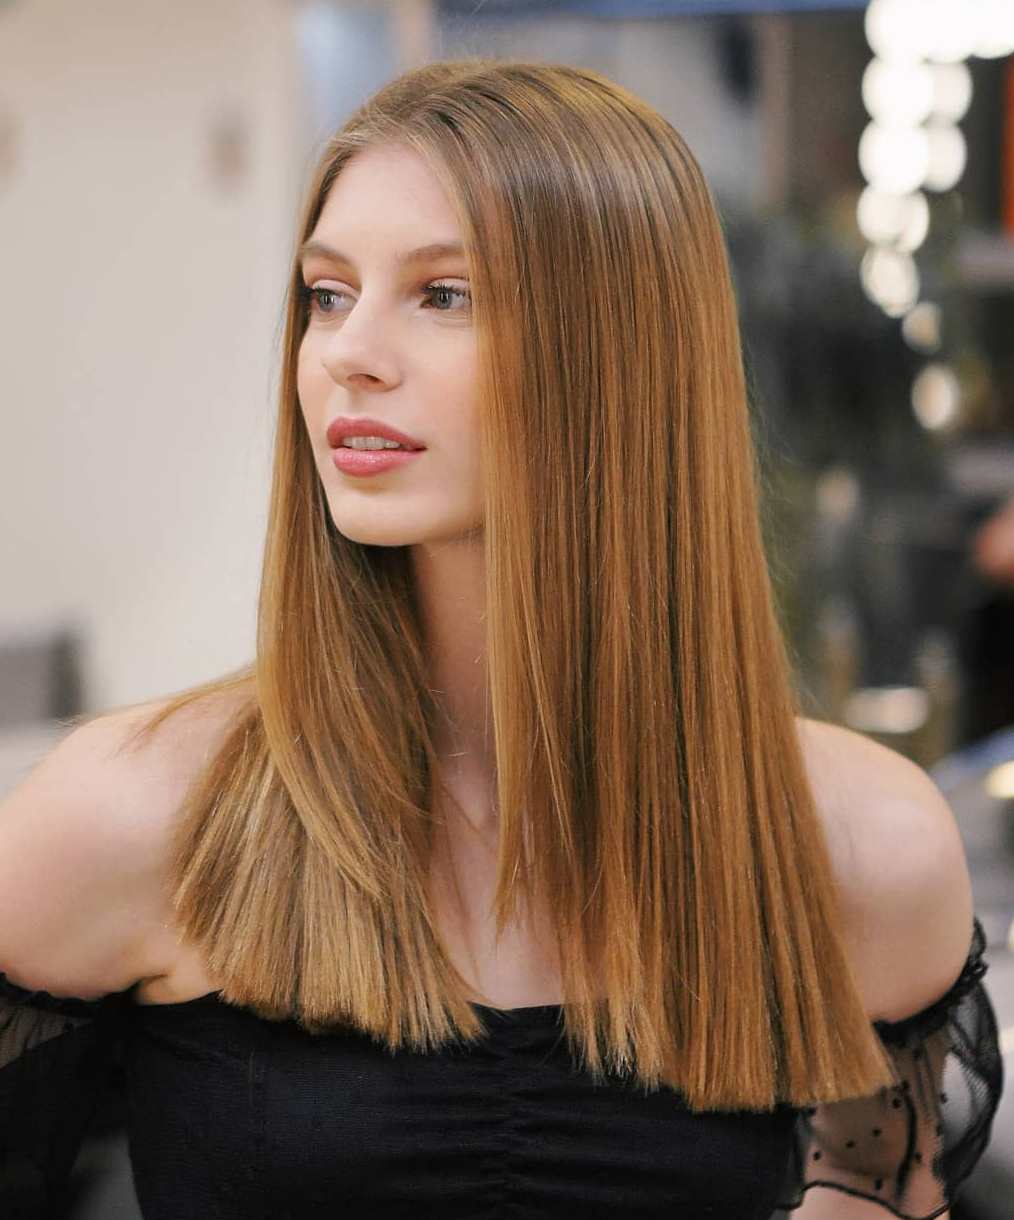 Sleek Blunt Cut on Long Hair